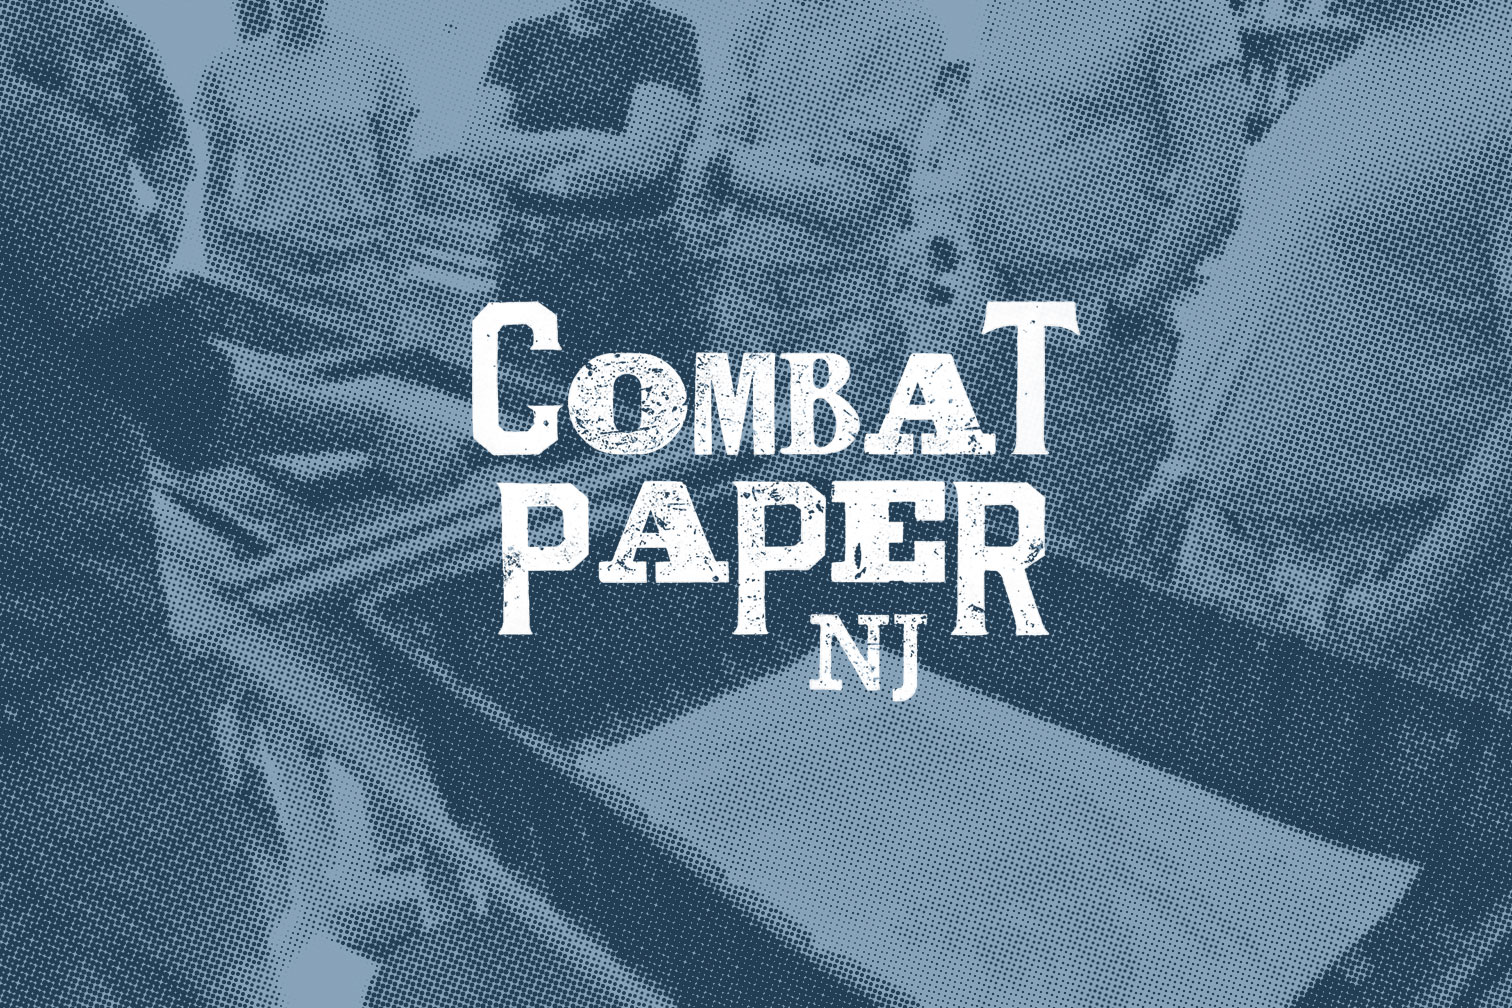 Combat Paper New Jersey